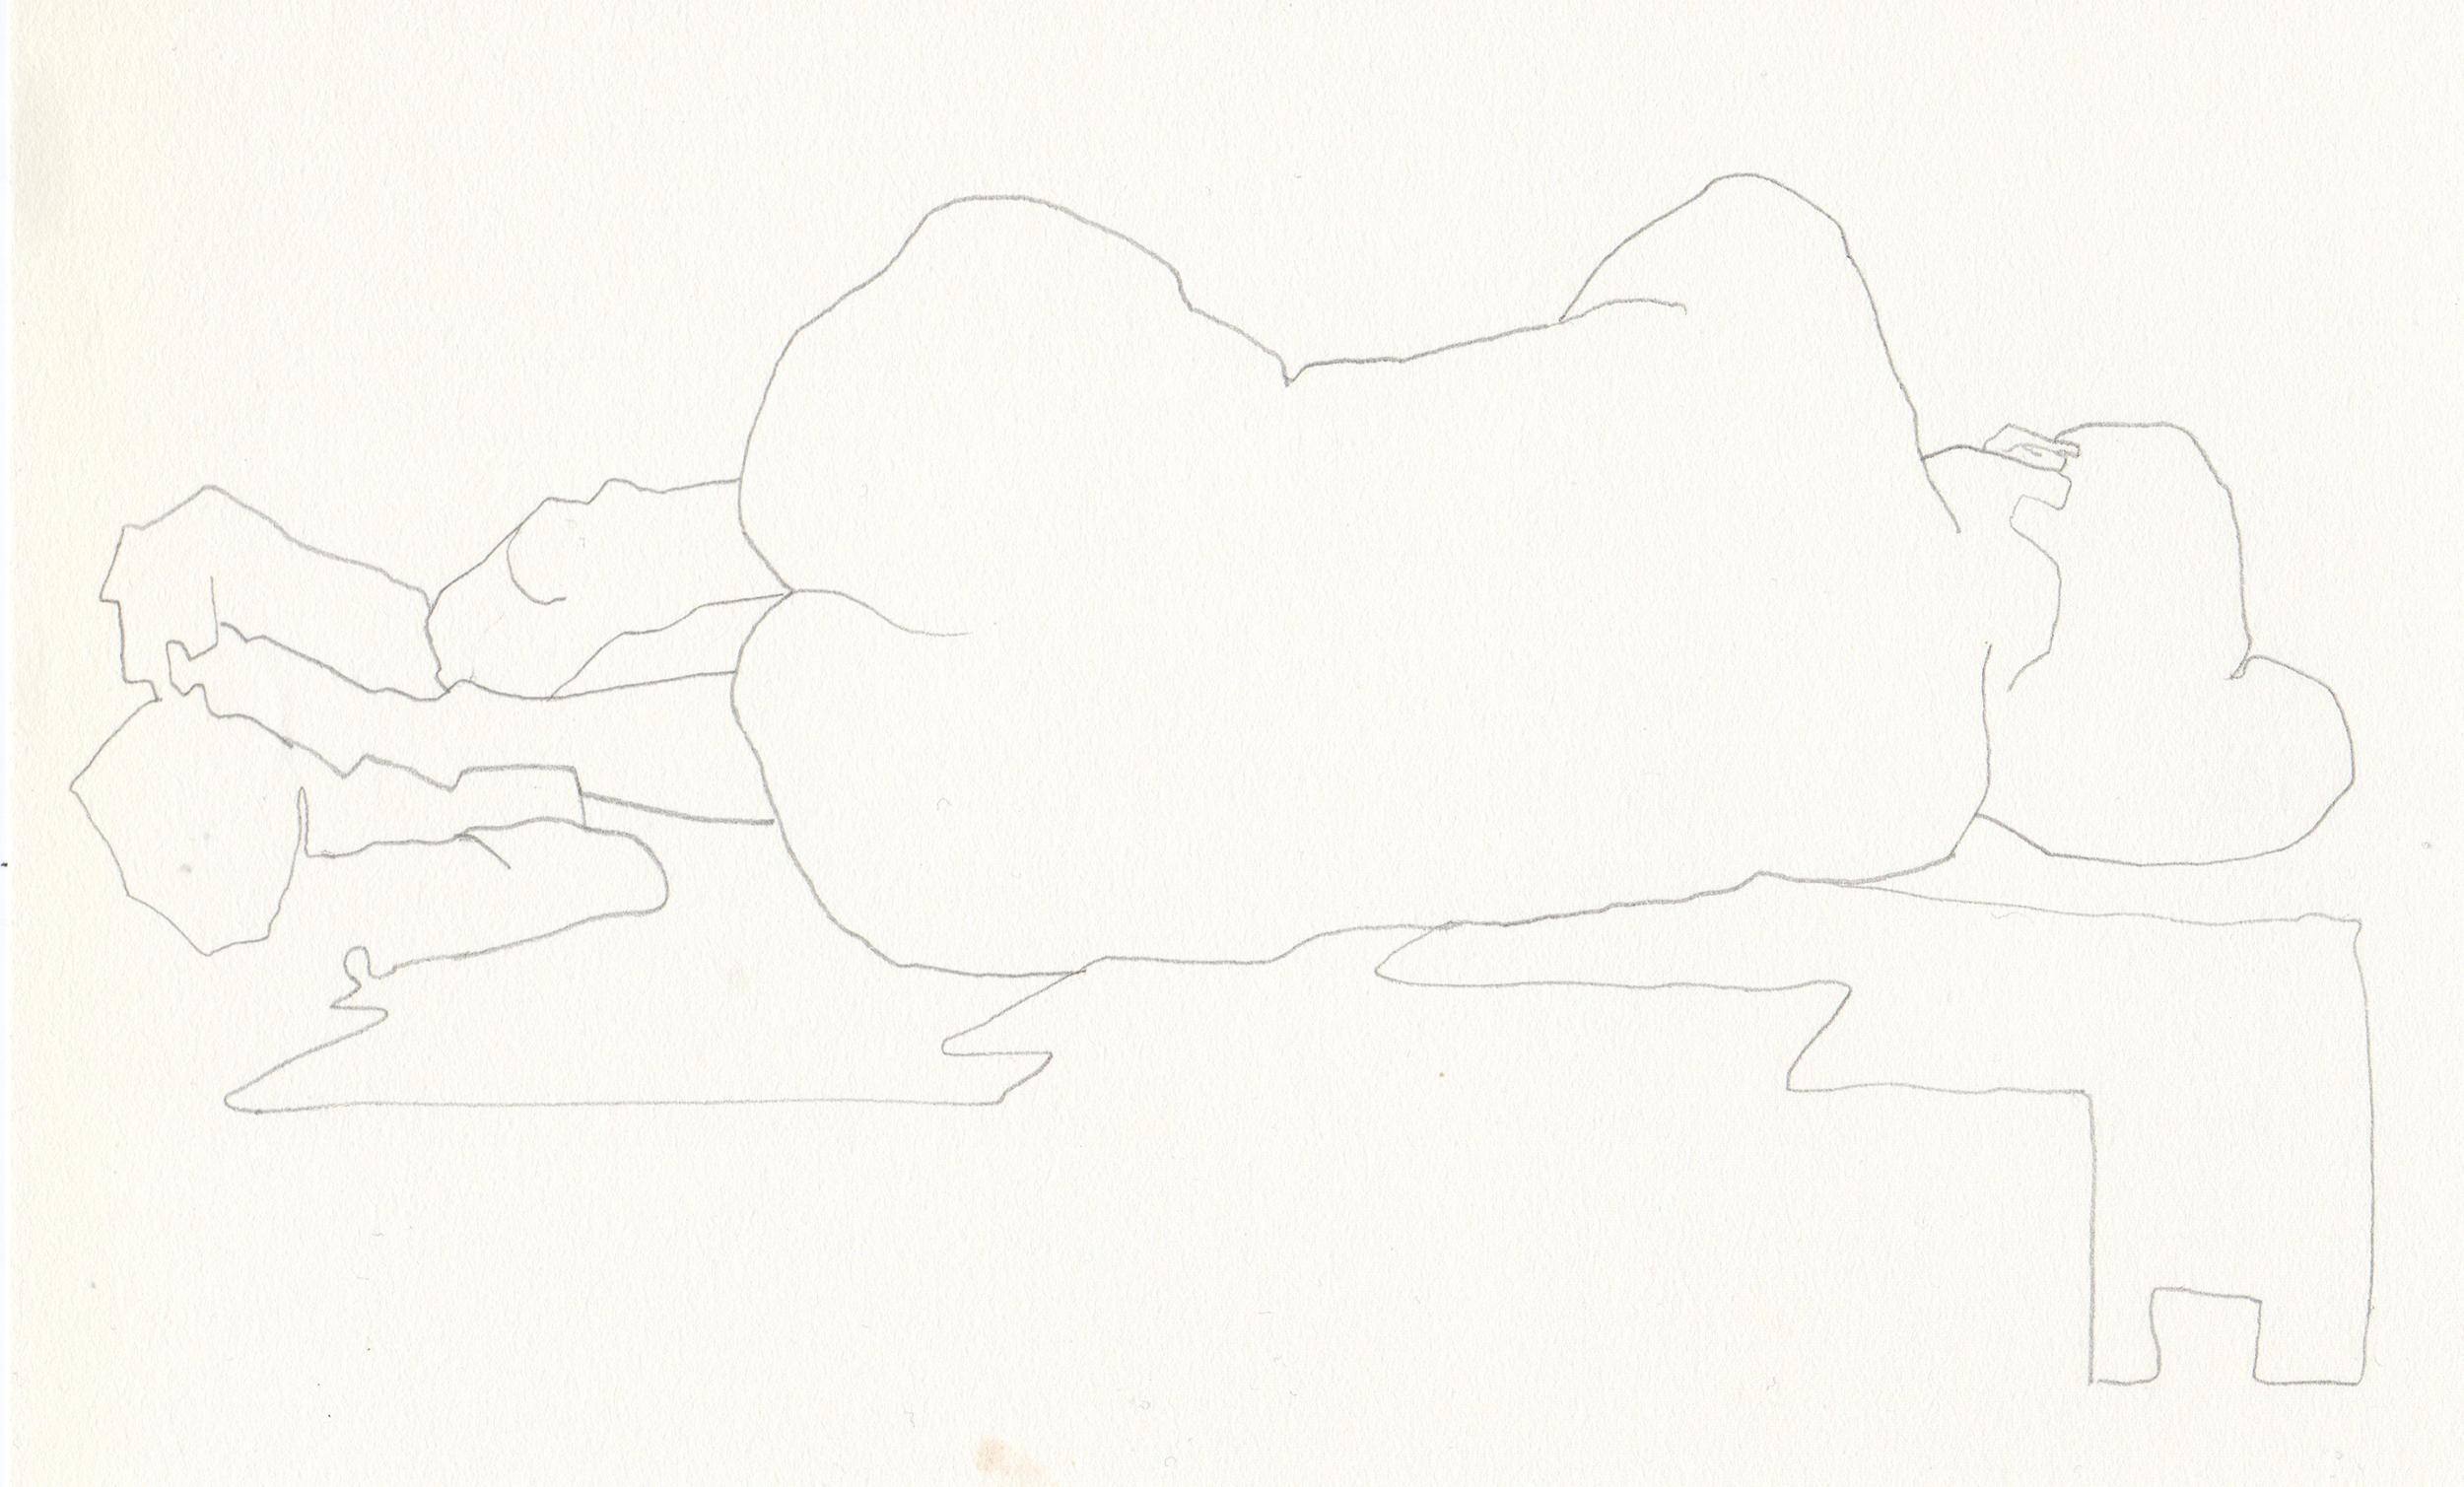 2012_Sketch_F-Beudin_023